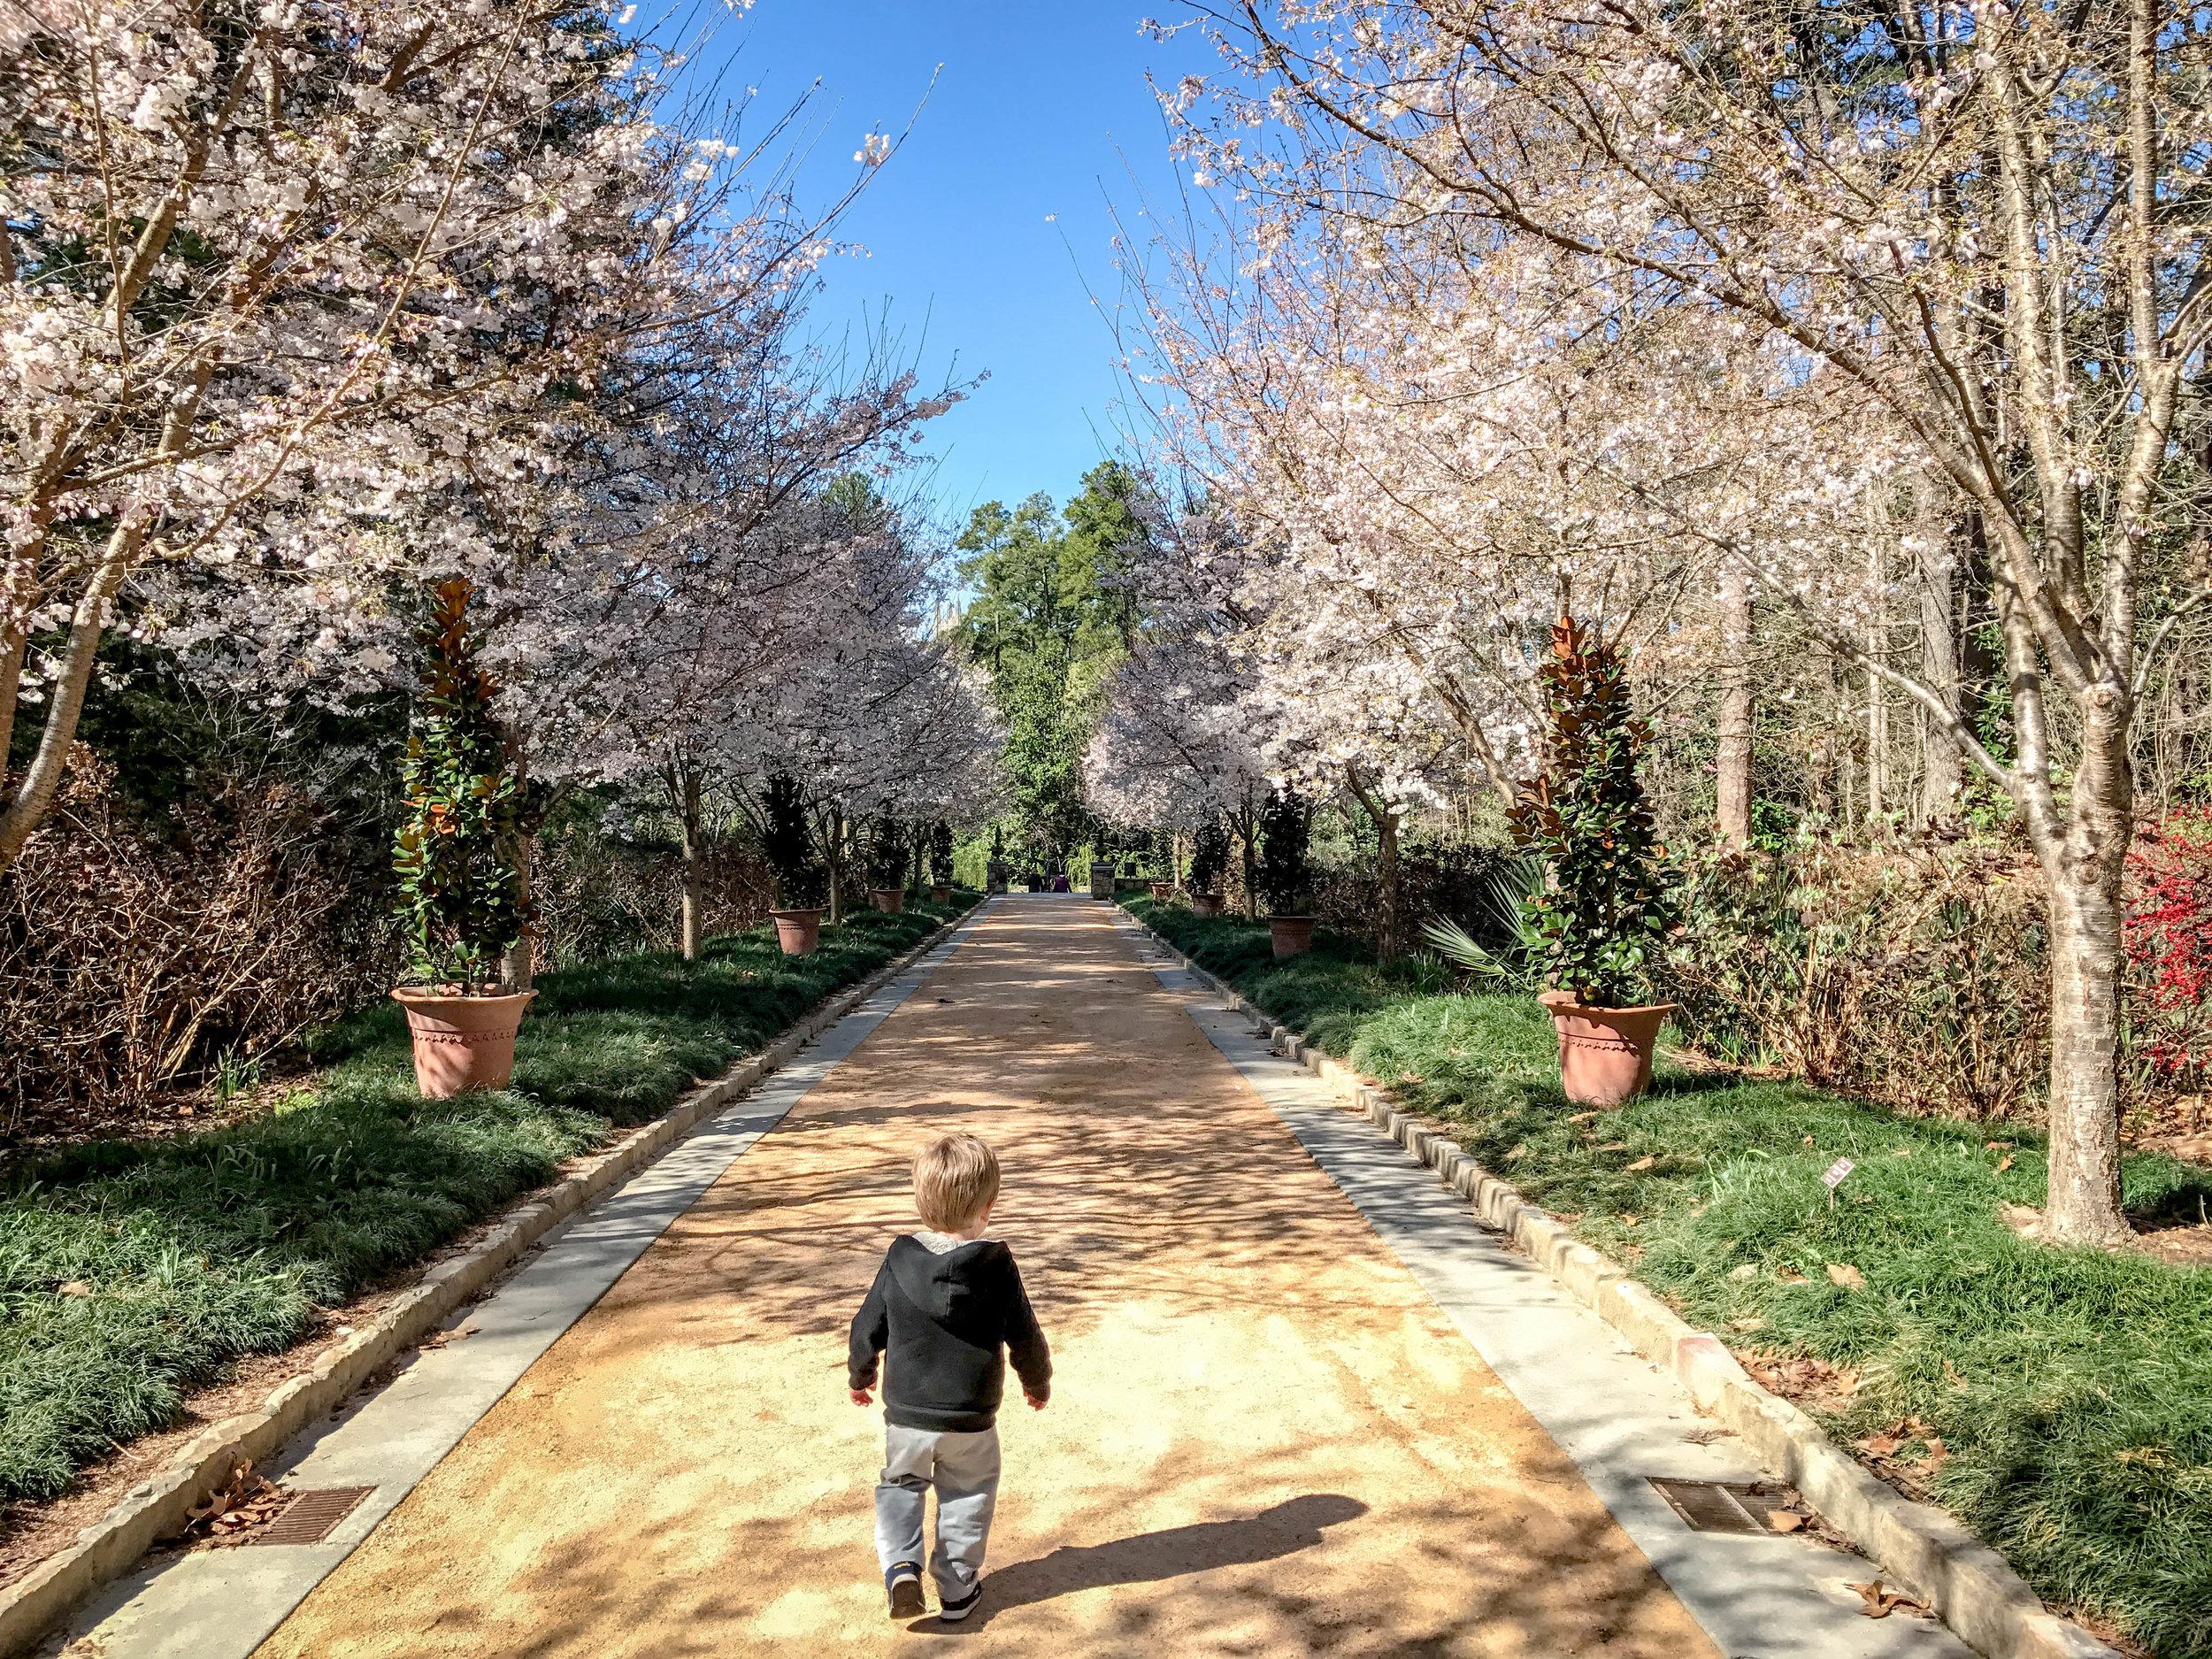 Max at the Duke Gardens entrance.